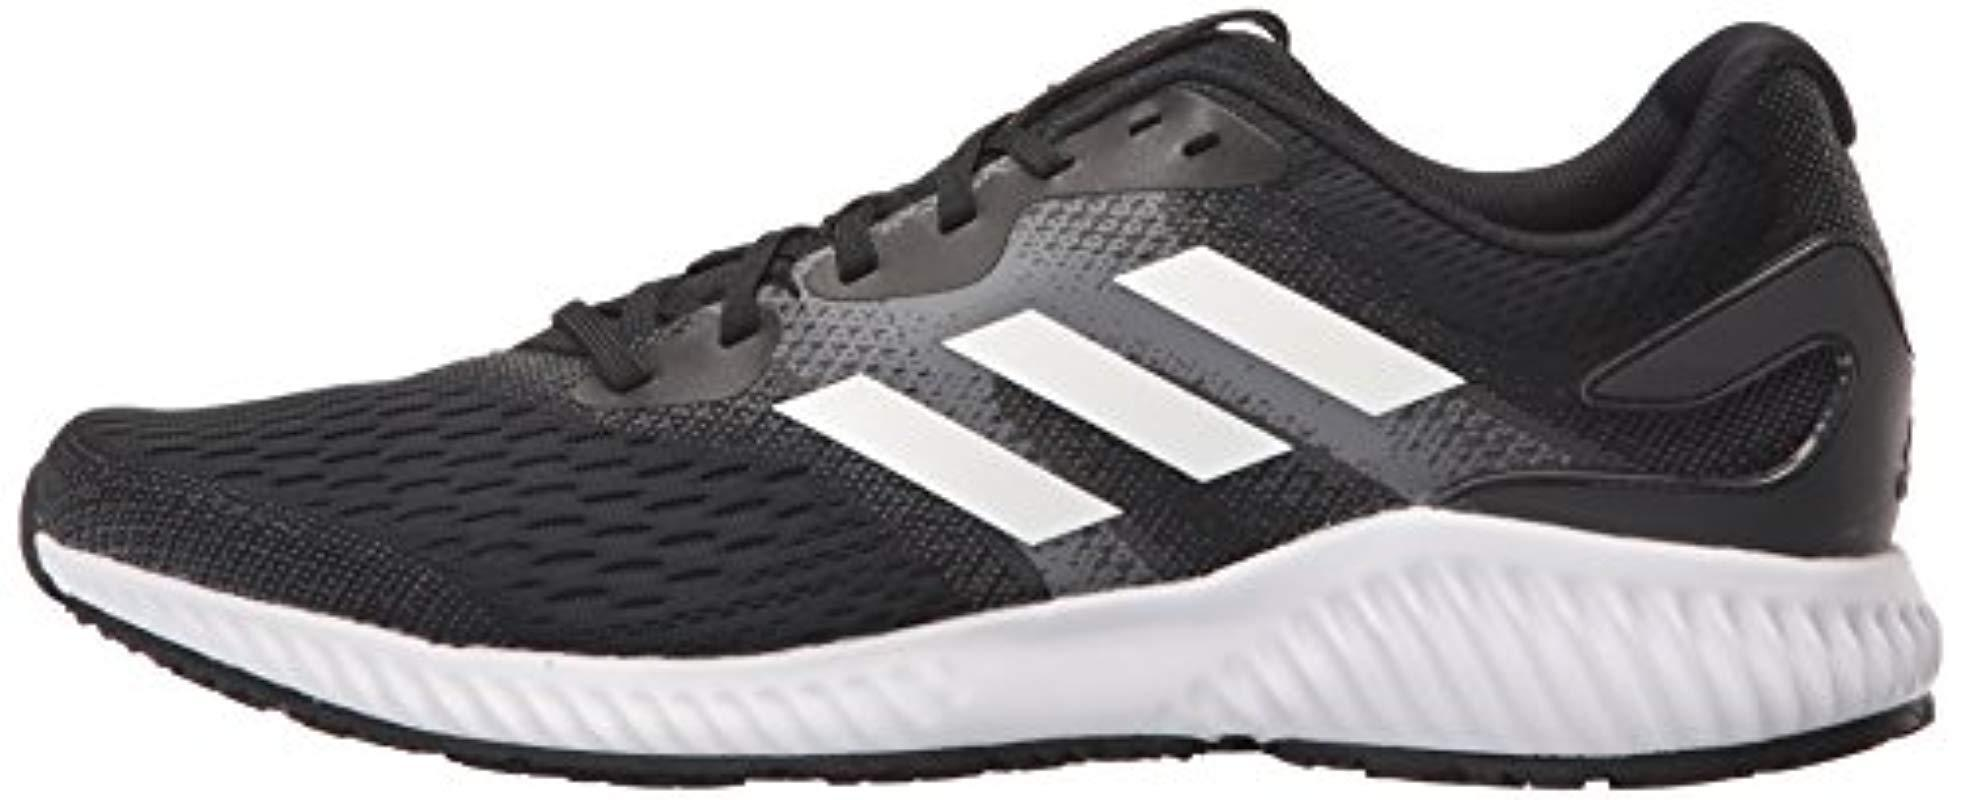 adidas Synthetic Aerobounce M Running Shoe in Black/White/White (Black) for Men